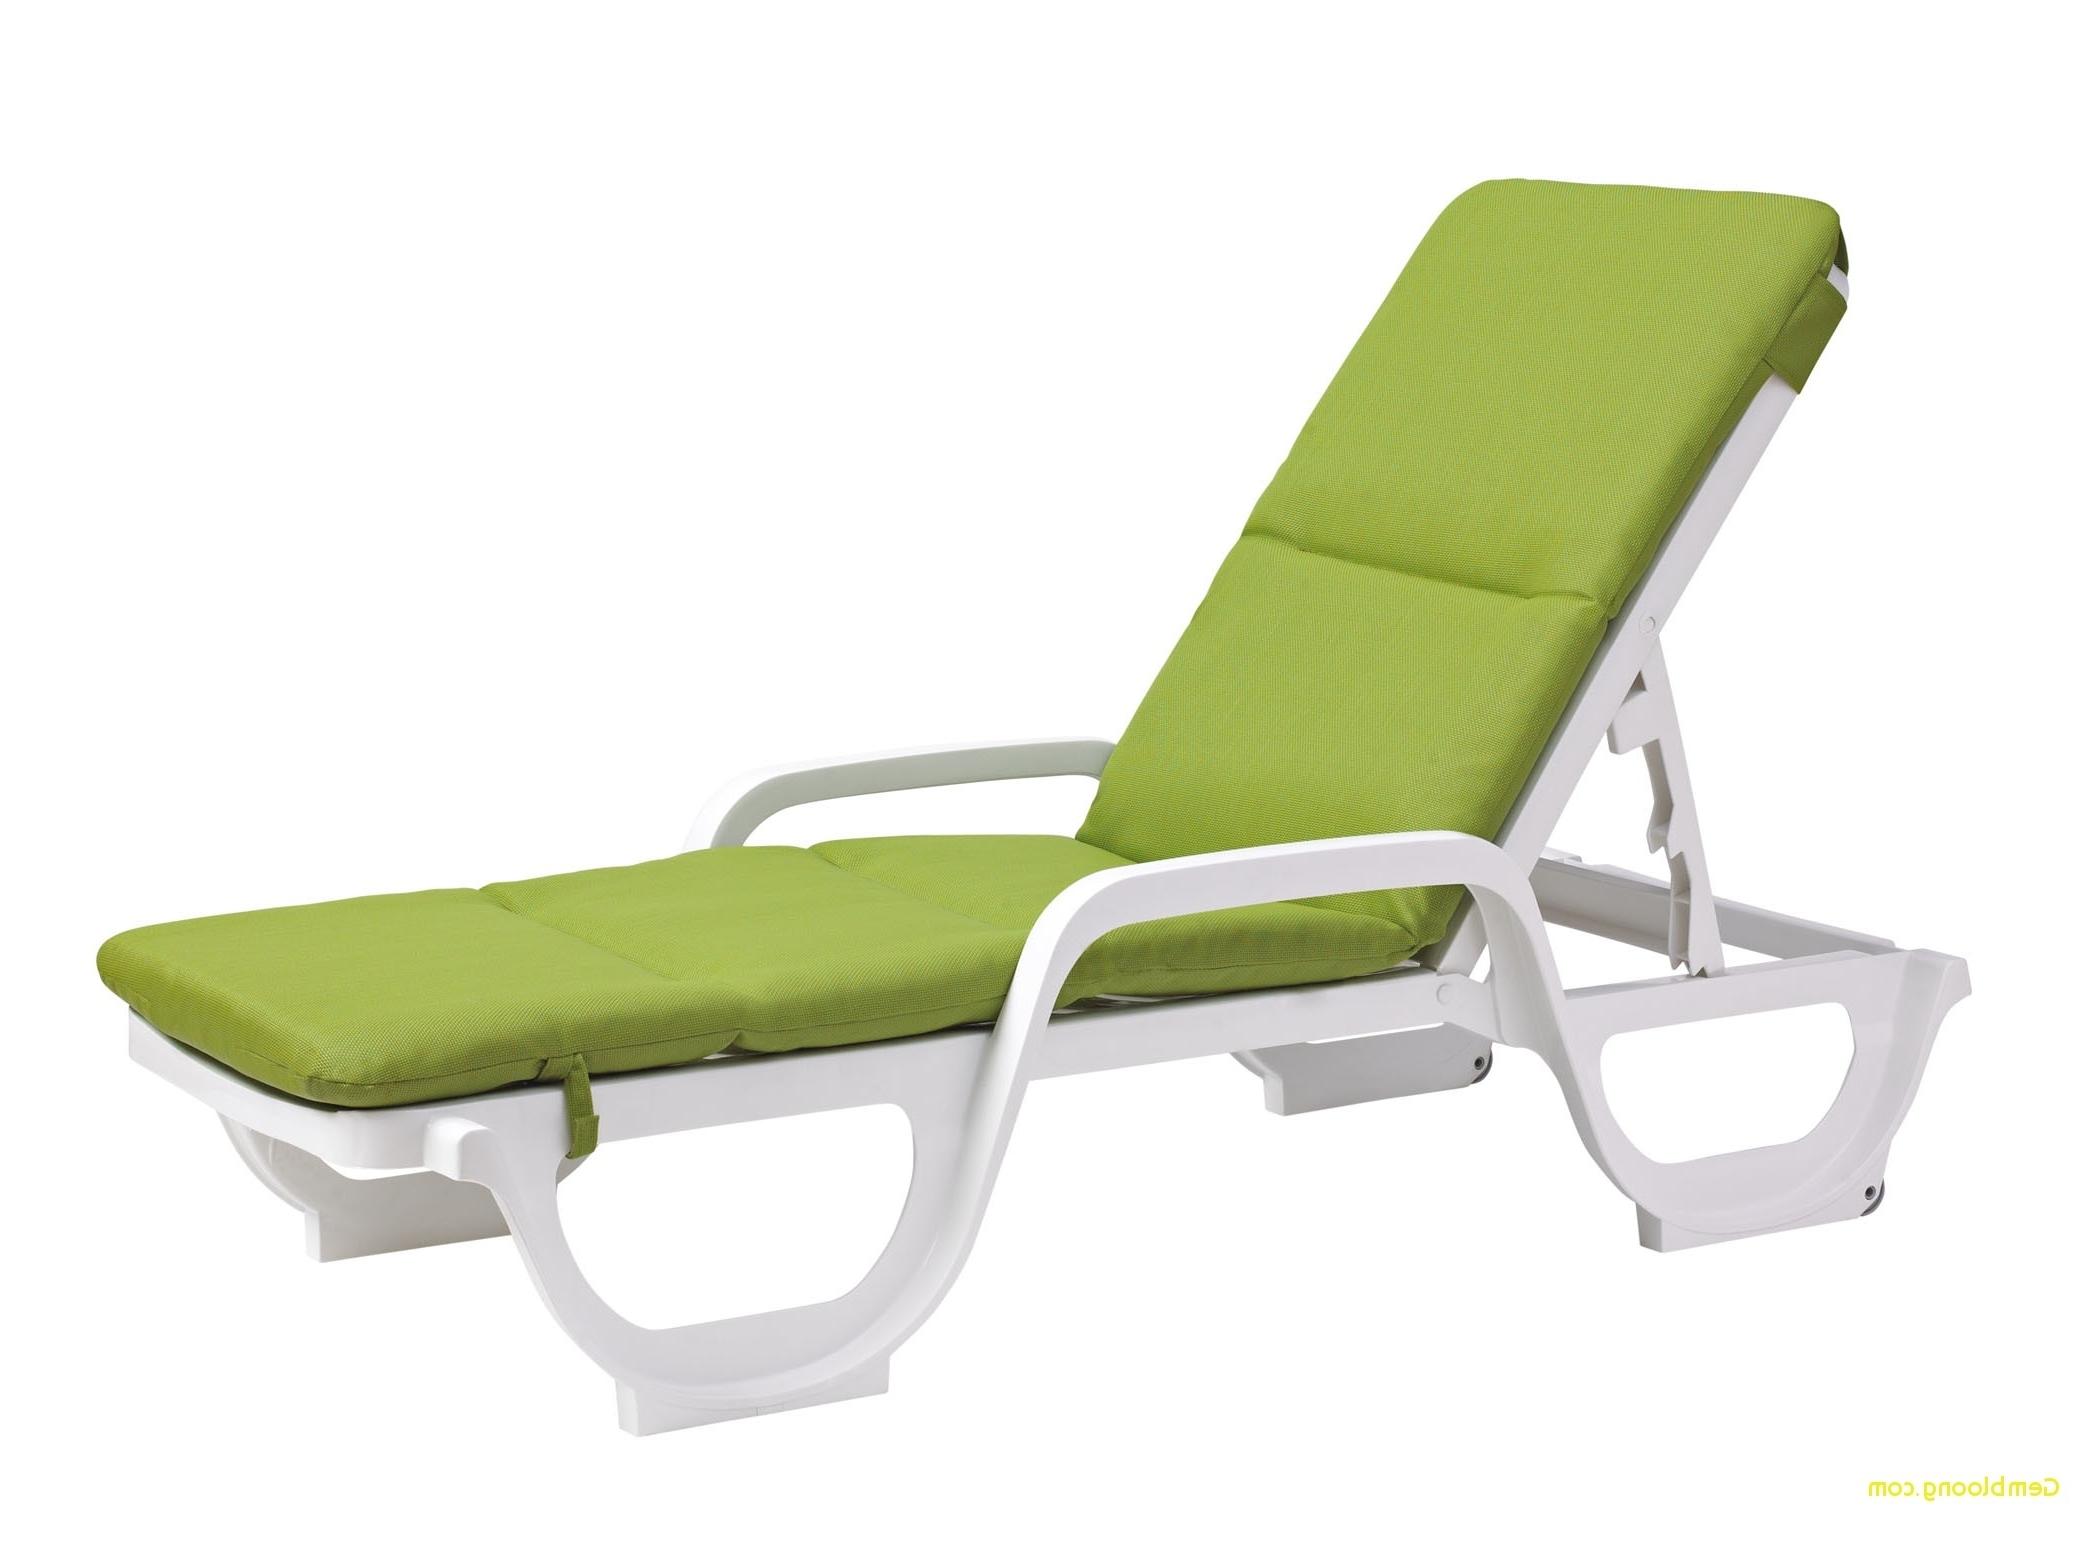 Cheap Chaise Lounge Cushions Regarding 2018 Discount Outdoor Chaise Lounge Cushions Elegant Cushion Clipart (View 7 of 15)